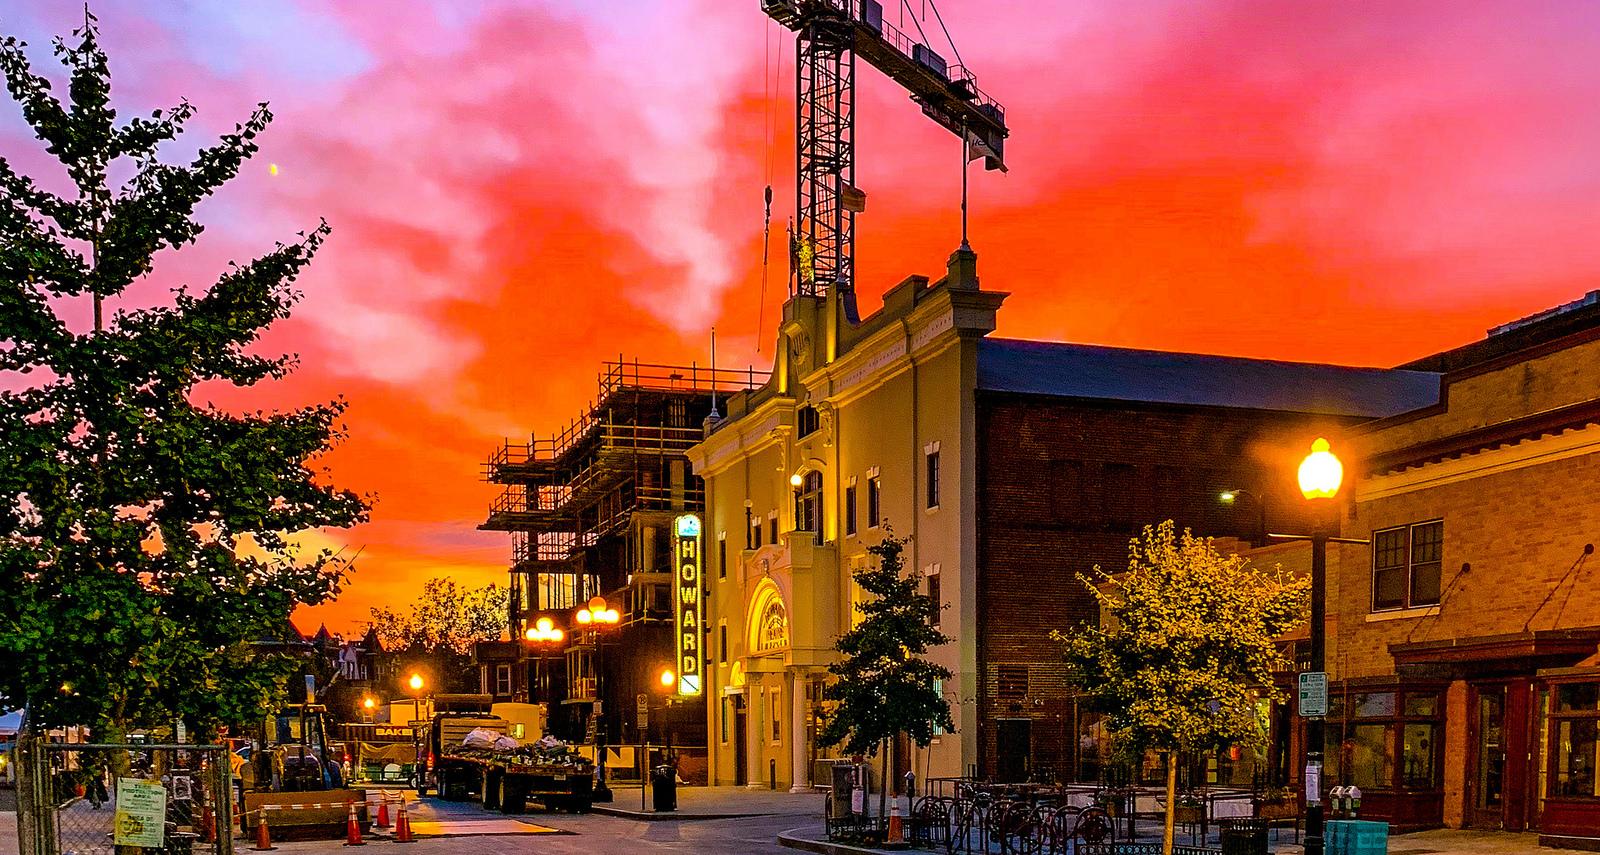 2018.10.26 Howard Theatre at Dawn, Washington, DC USA 2728